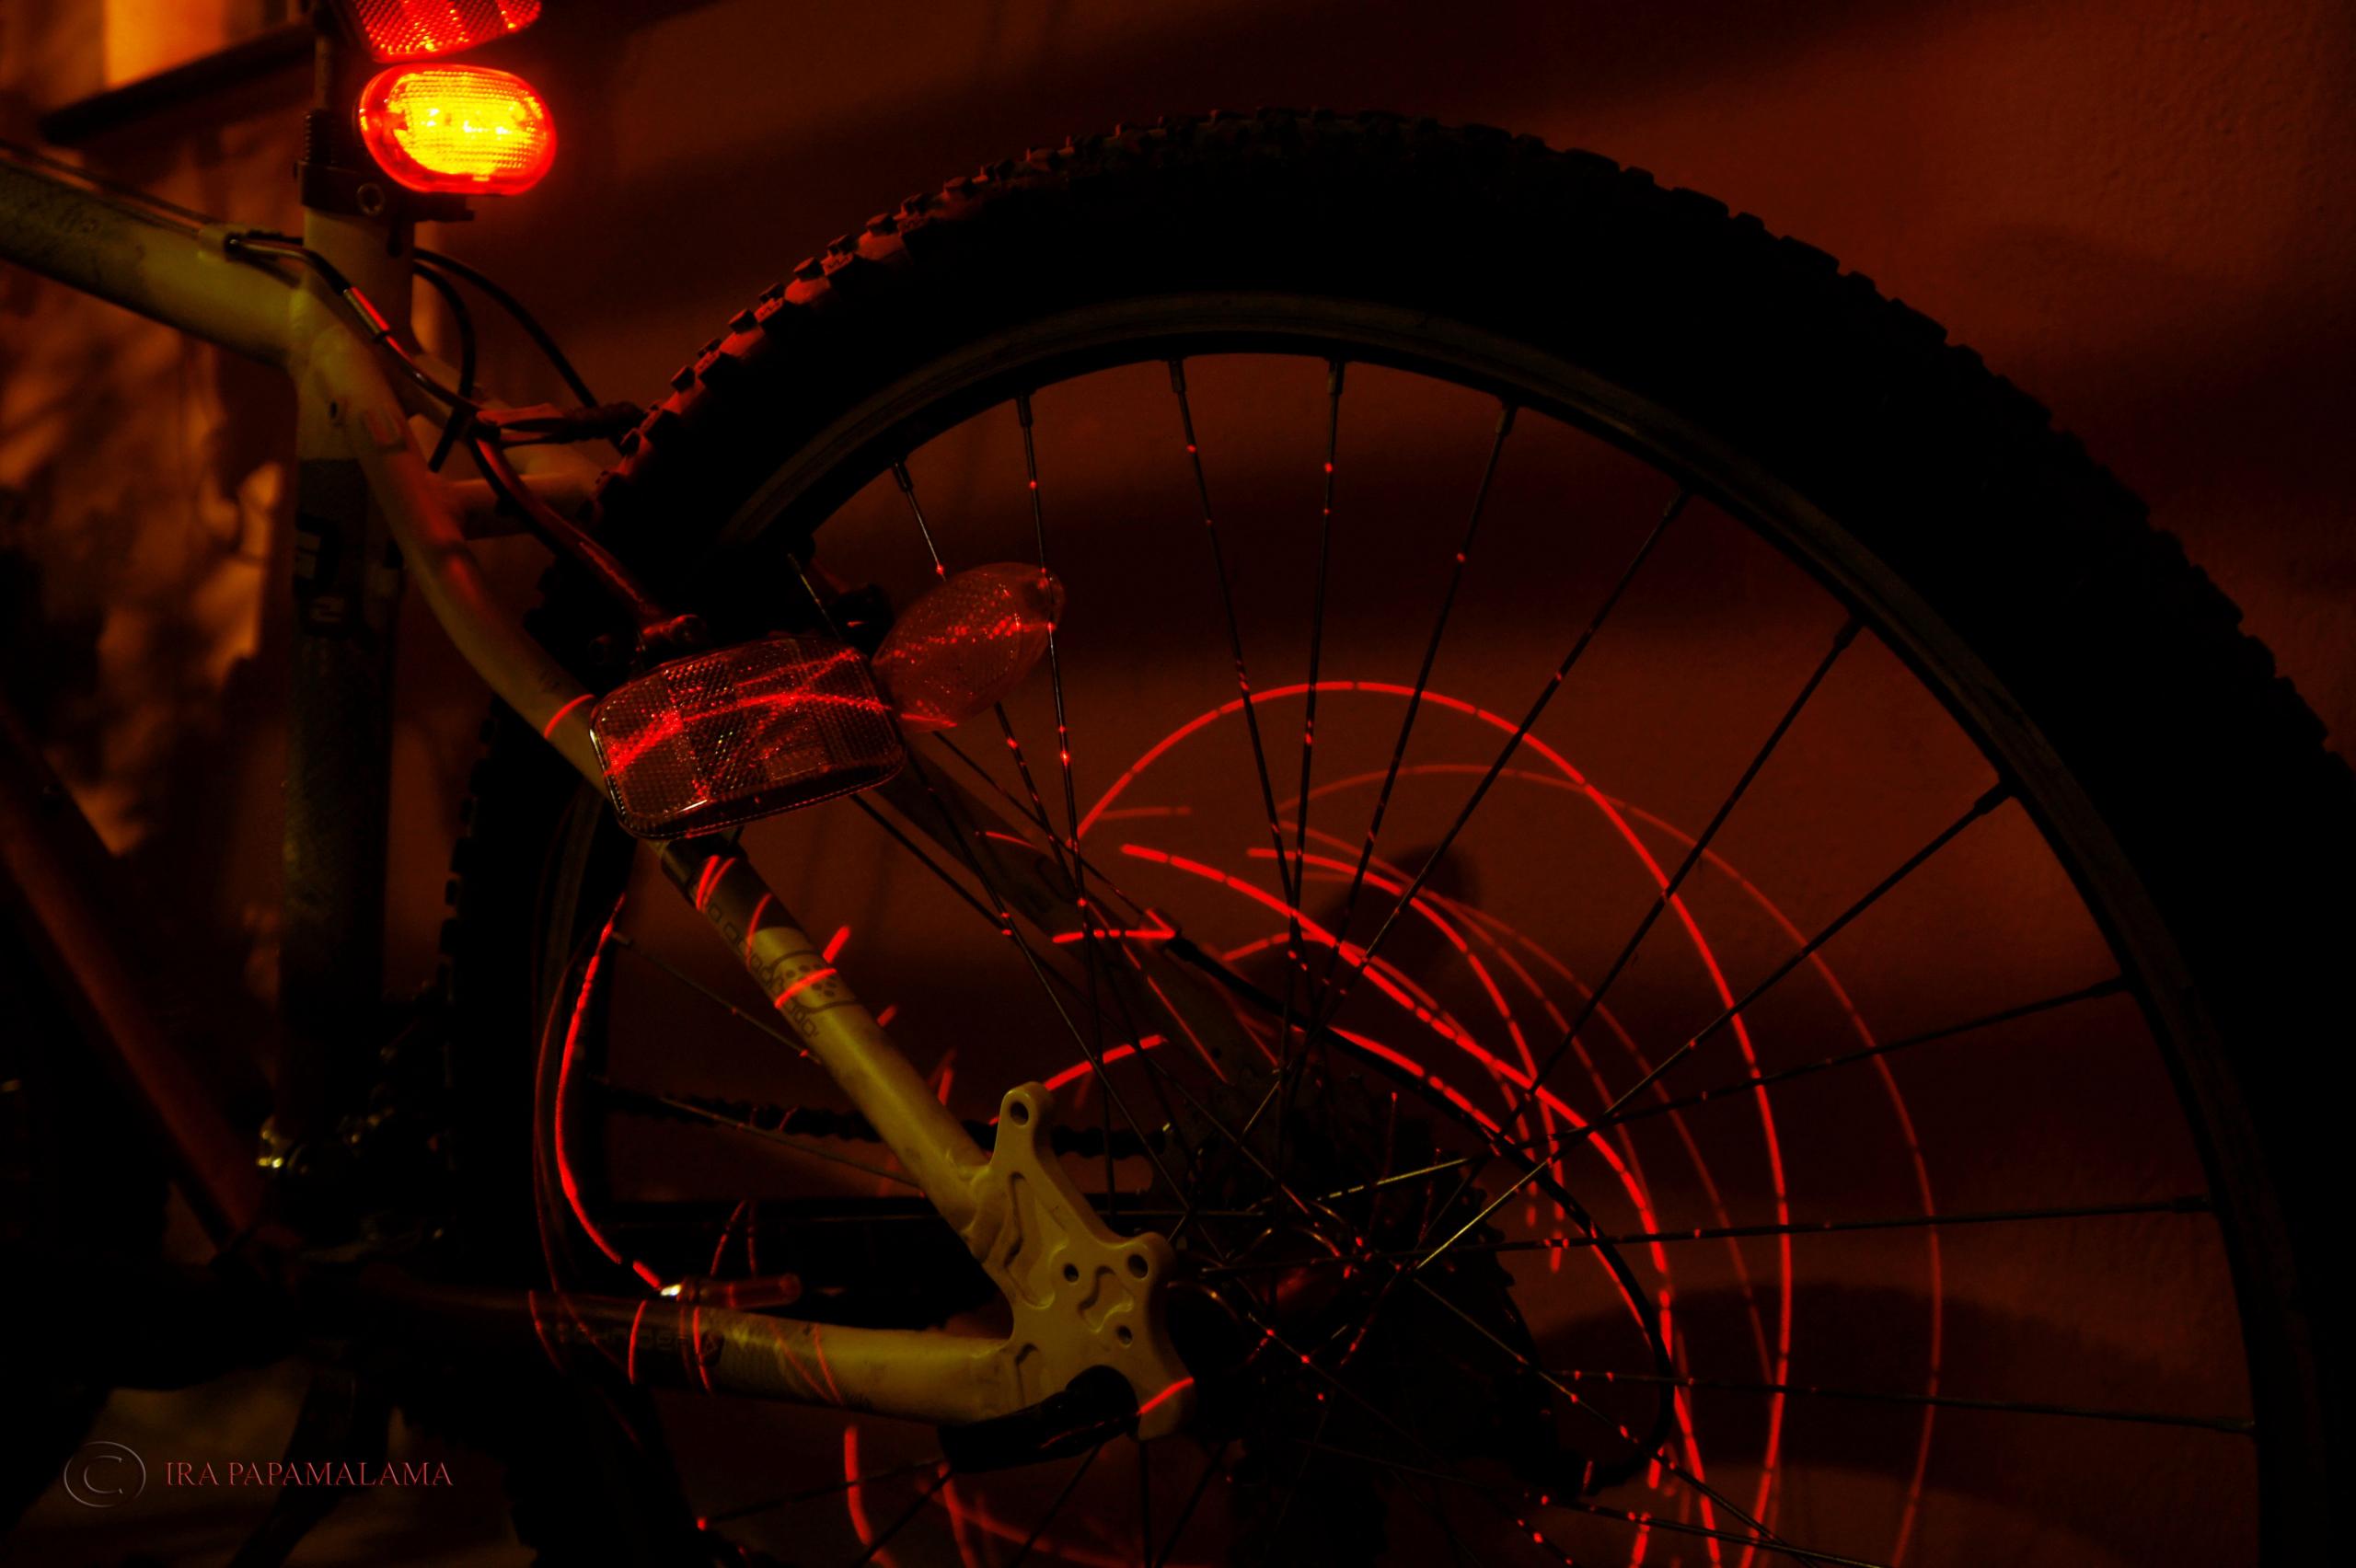 bicicleta de pintura leve